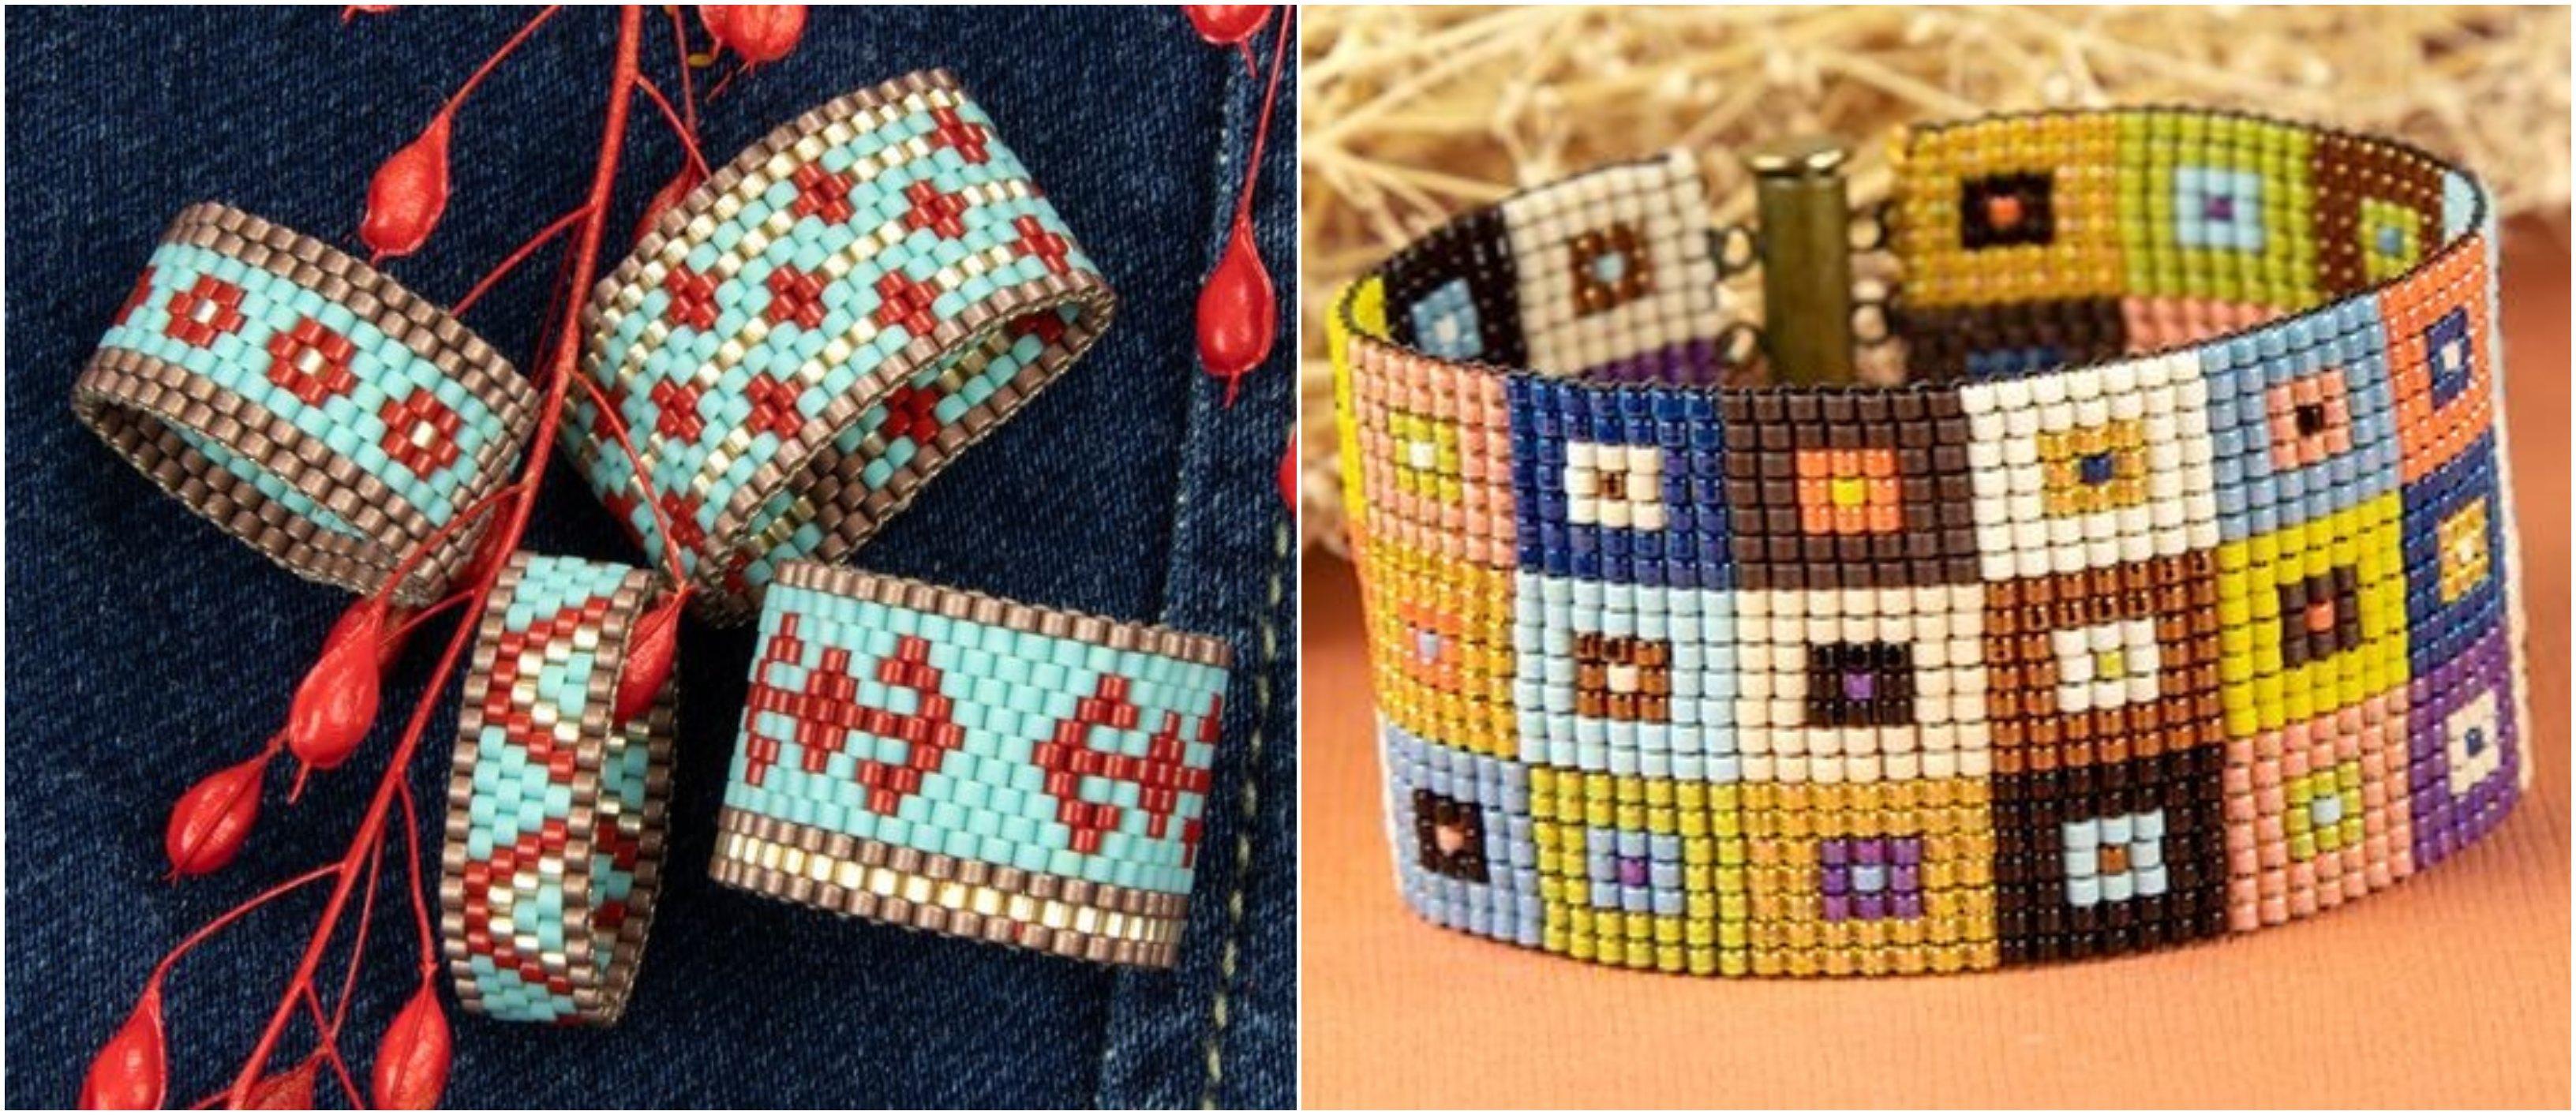 TOHO Aiko Seed Bead Jewelry